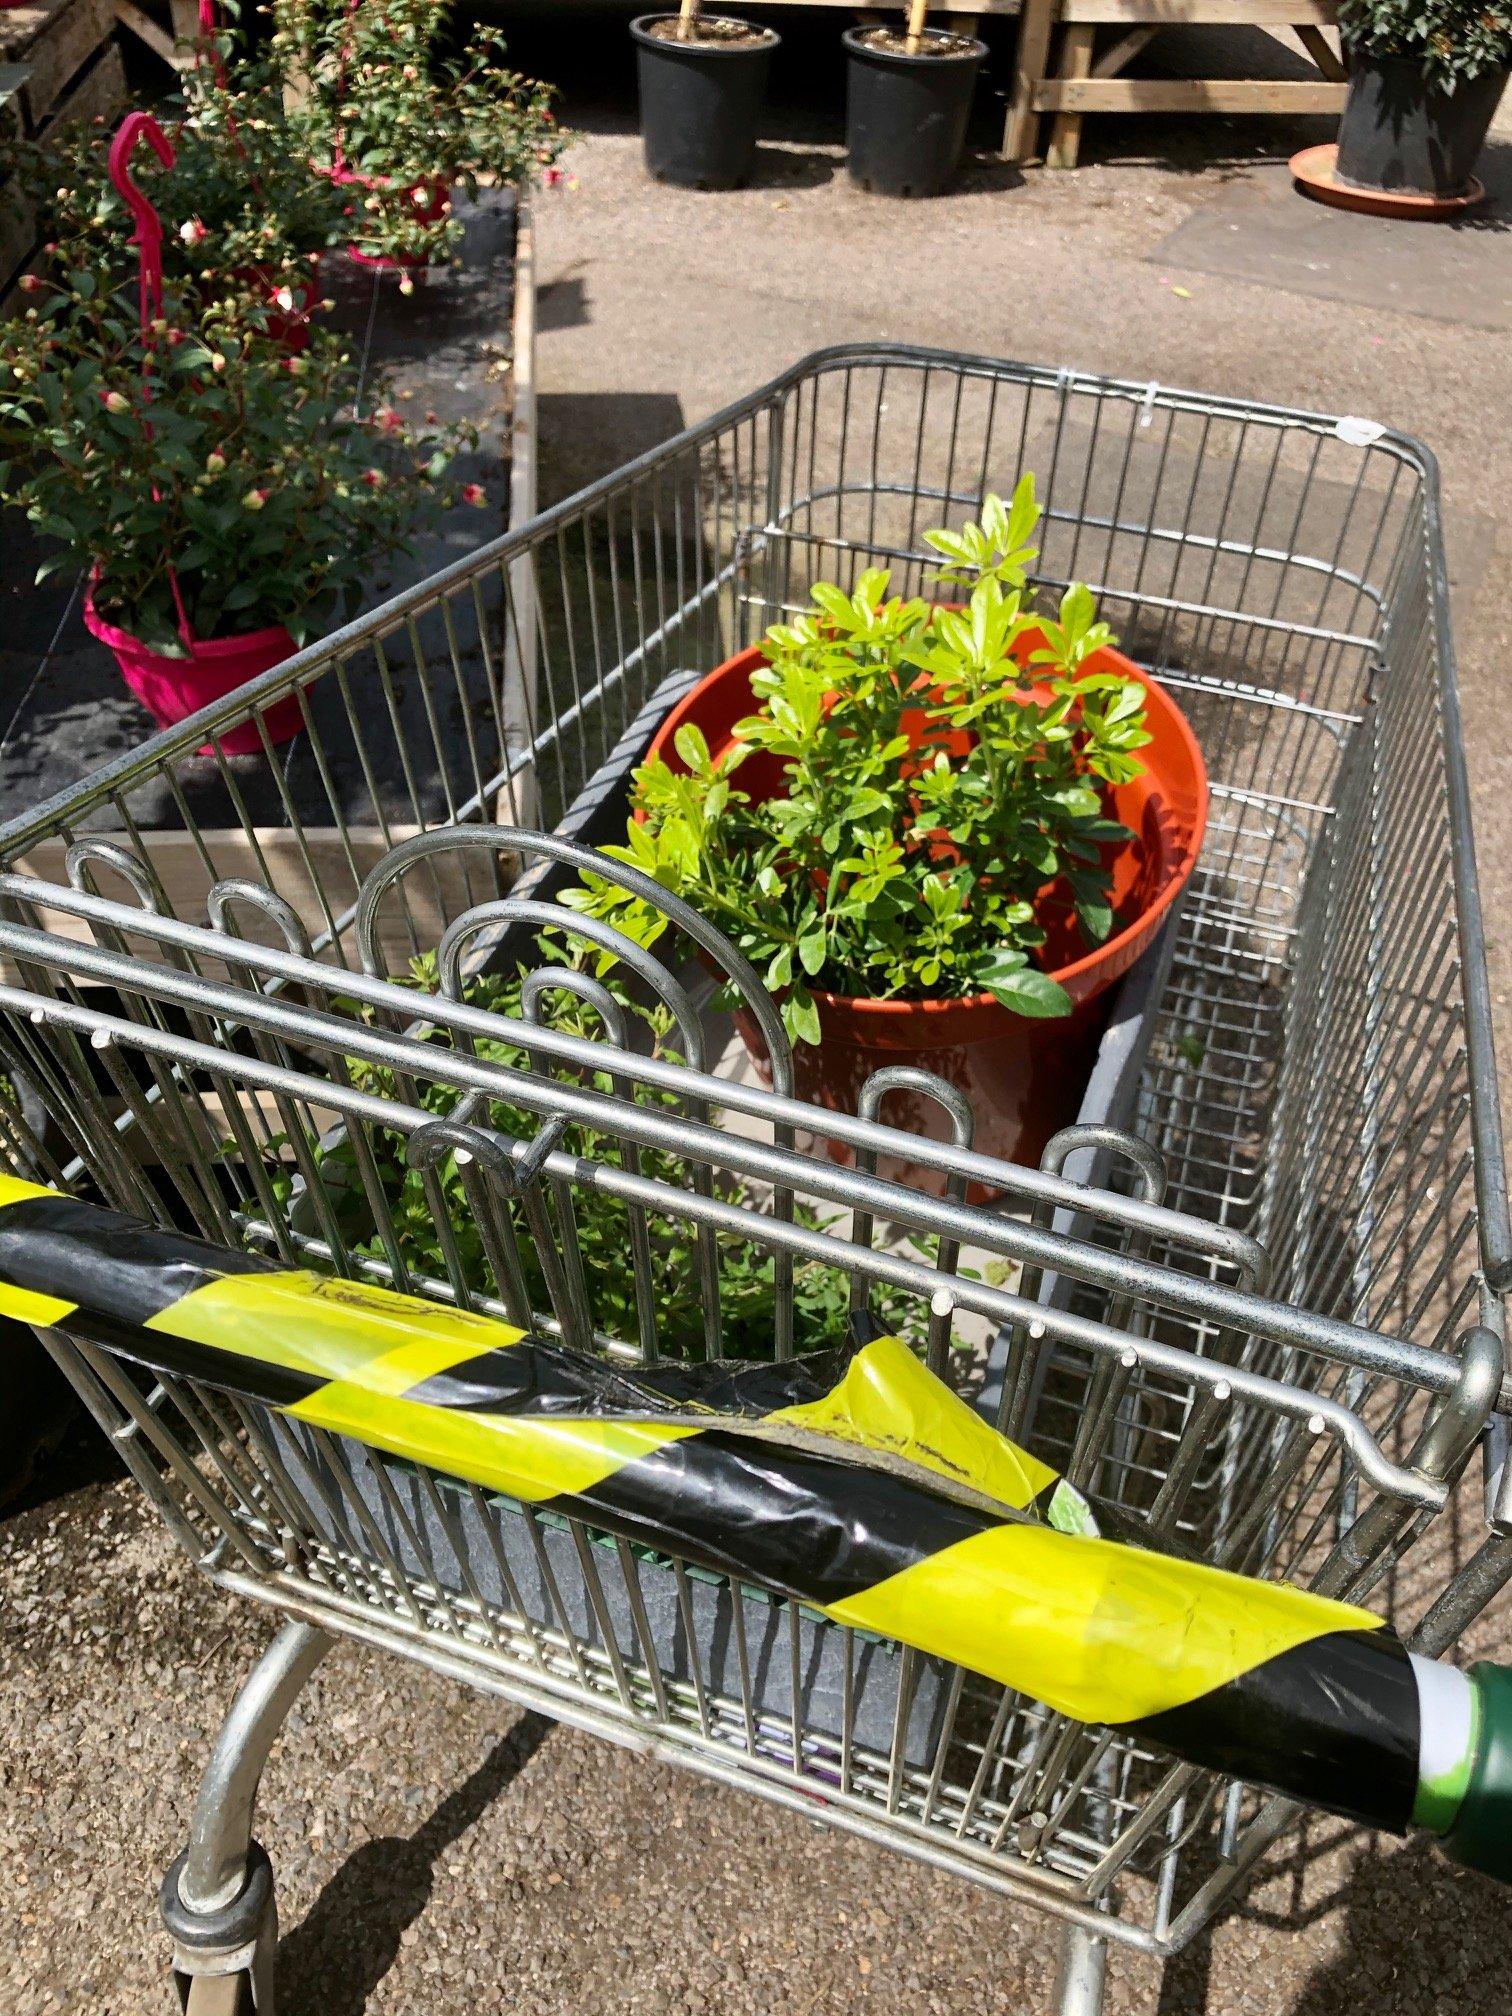 Using radios in a COVID-Secure garden centre